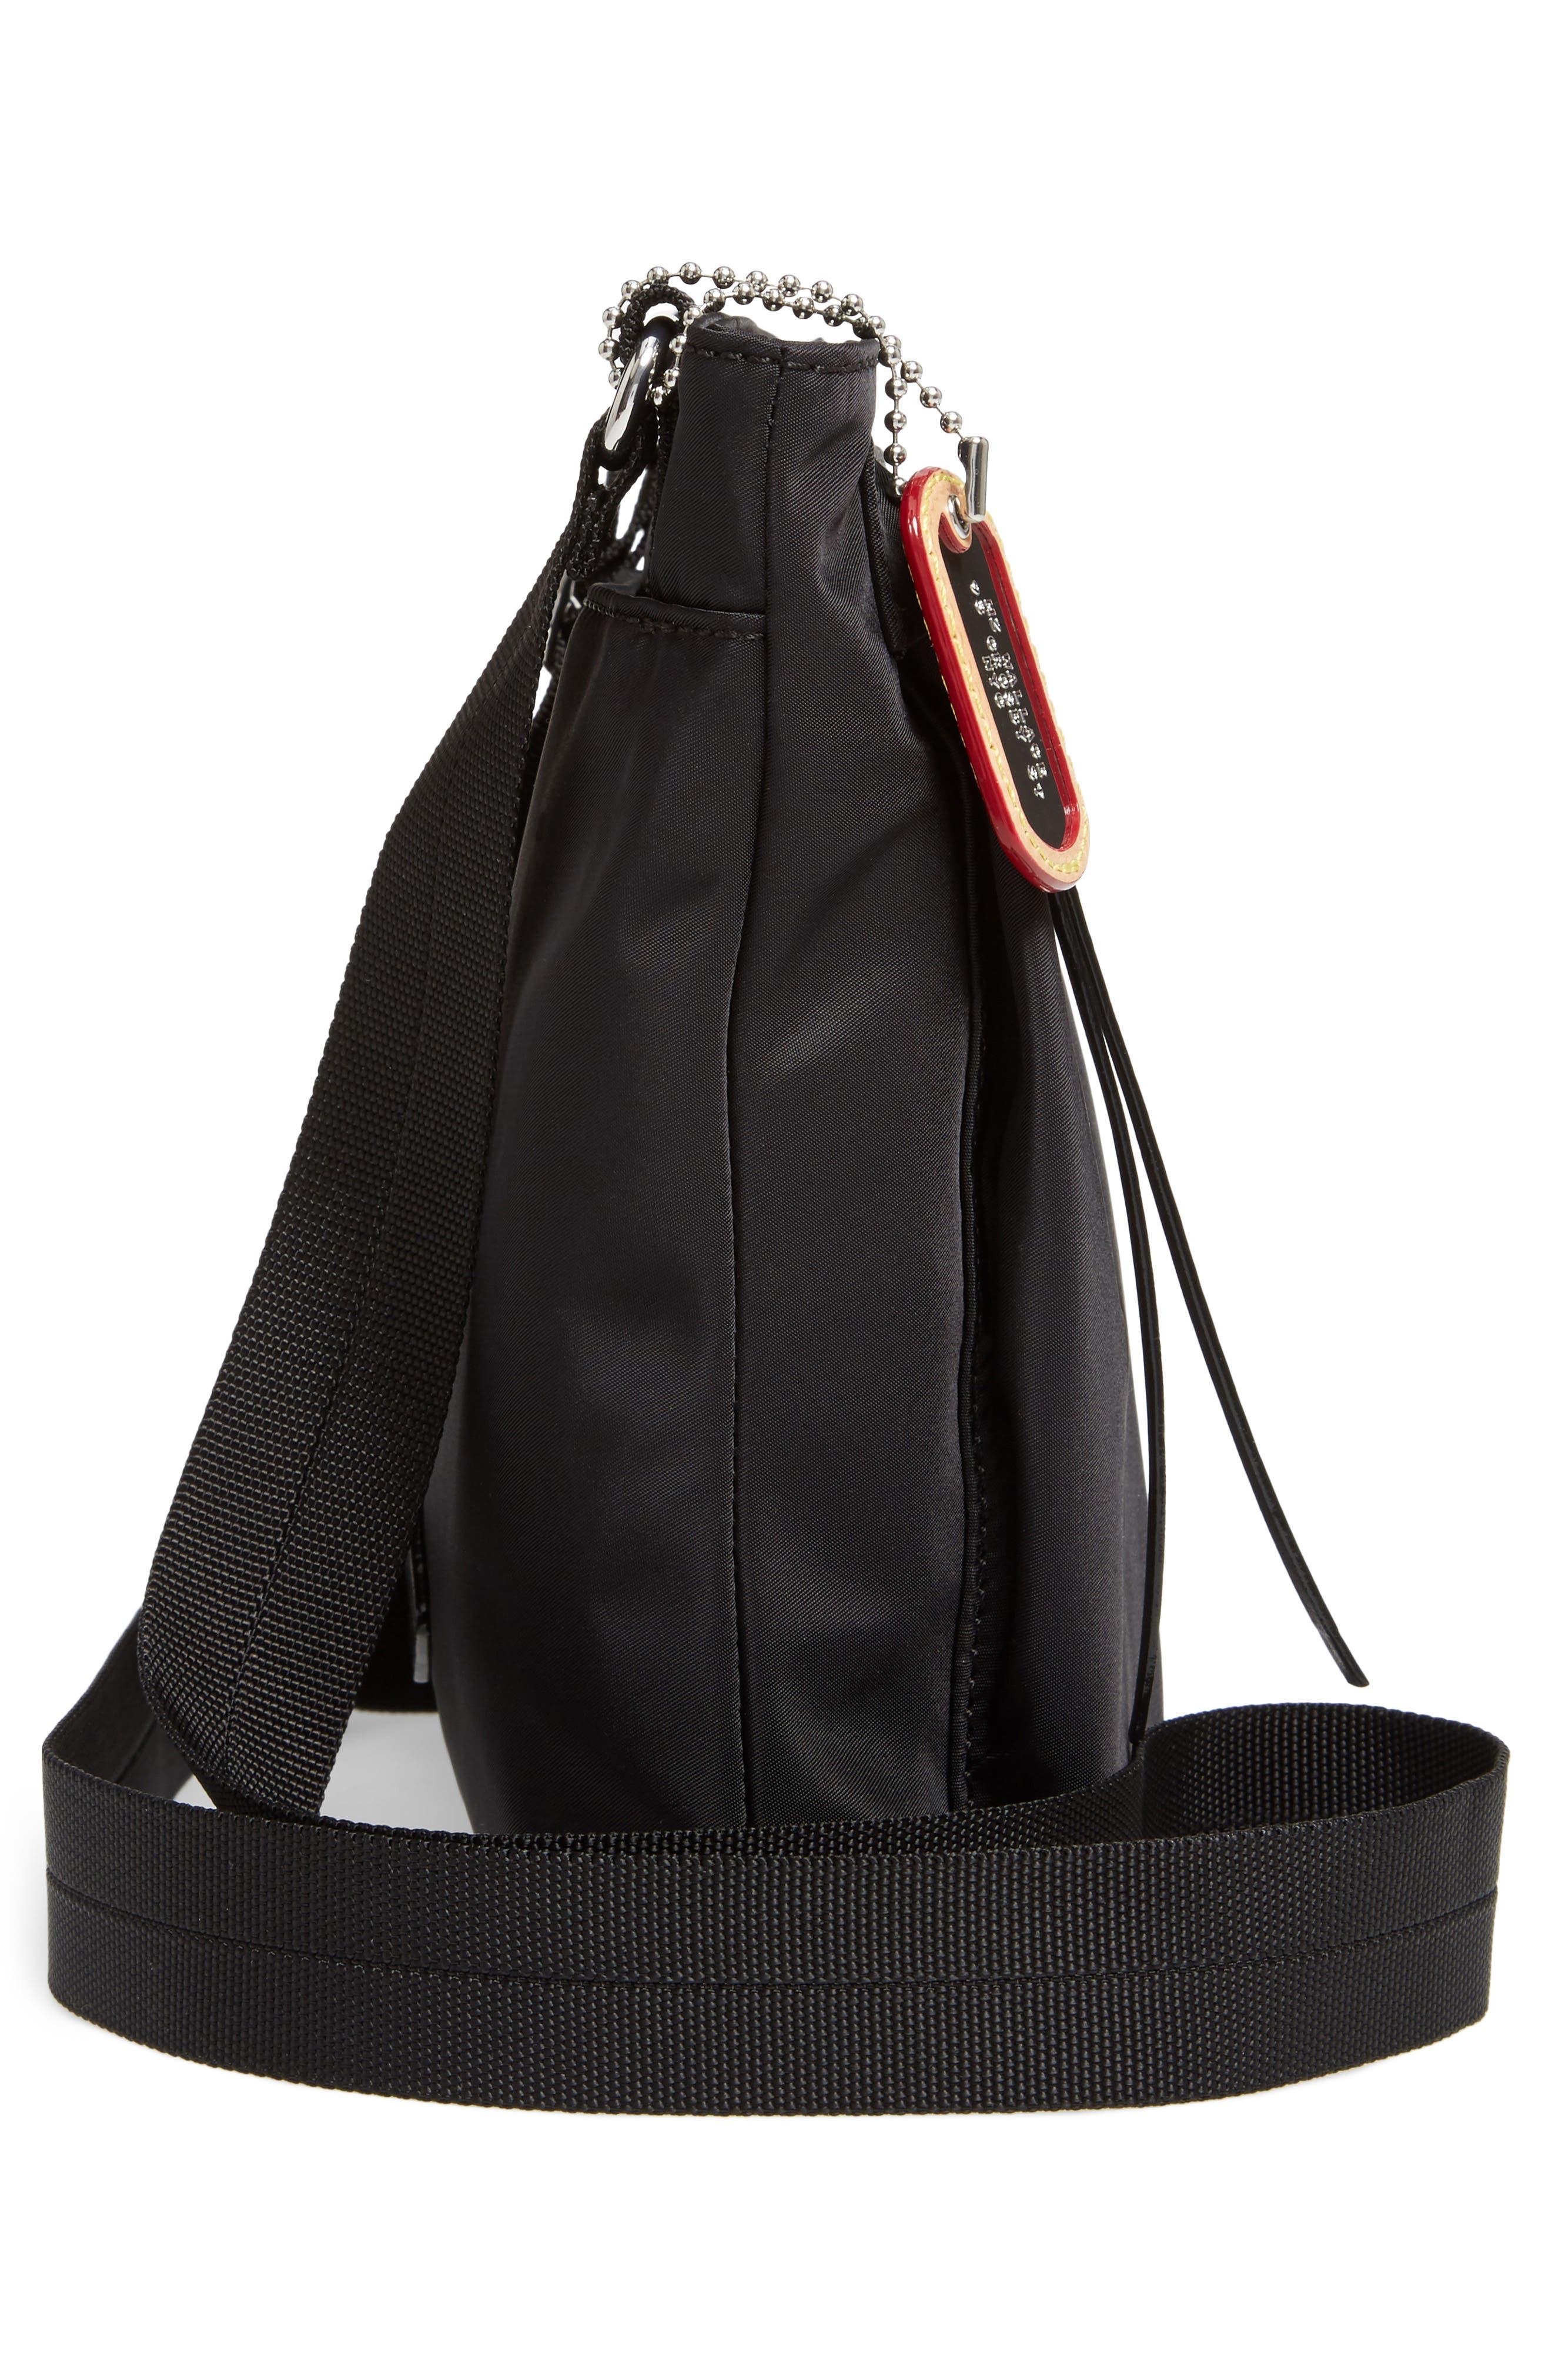 Jordan Bedford Nylon Crossbody Bag,                             Alternate thumbnail 5, color,                             008